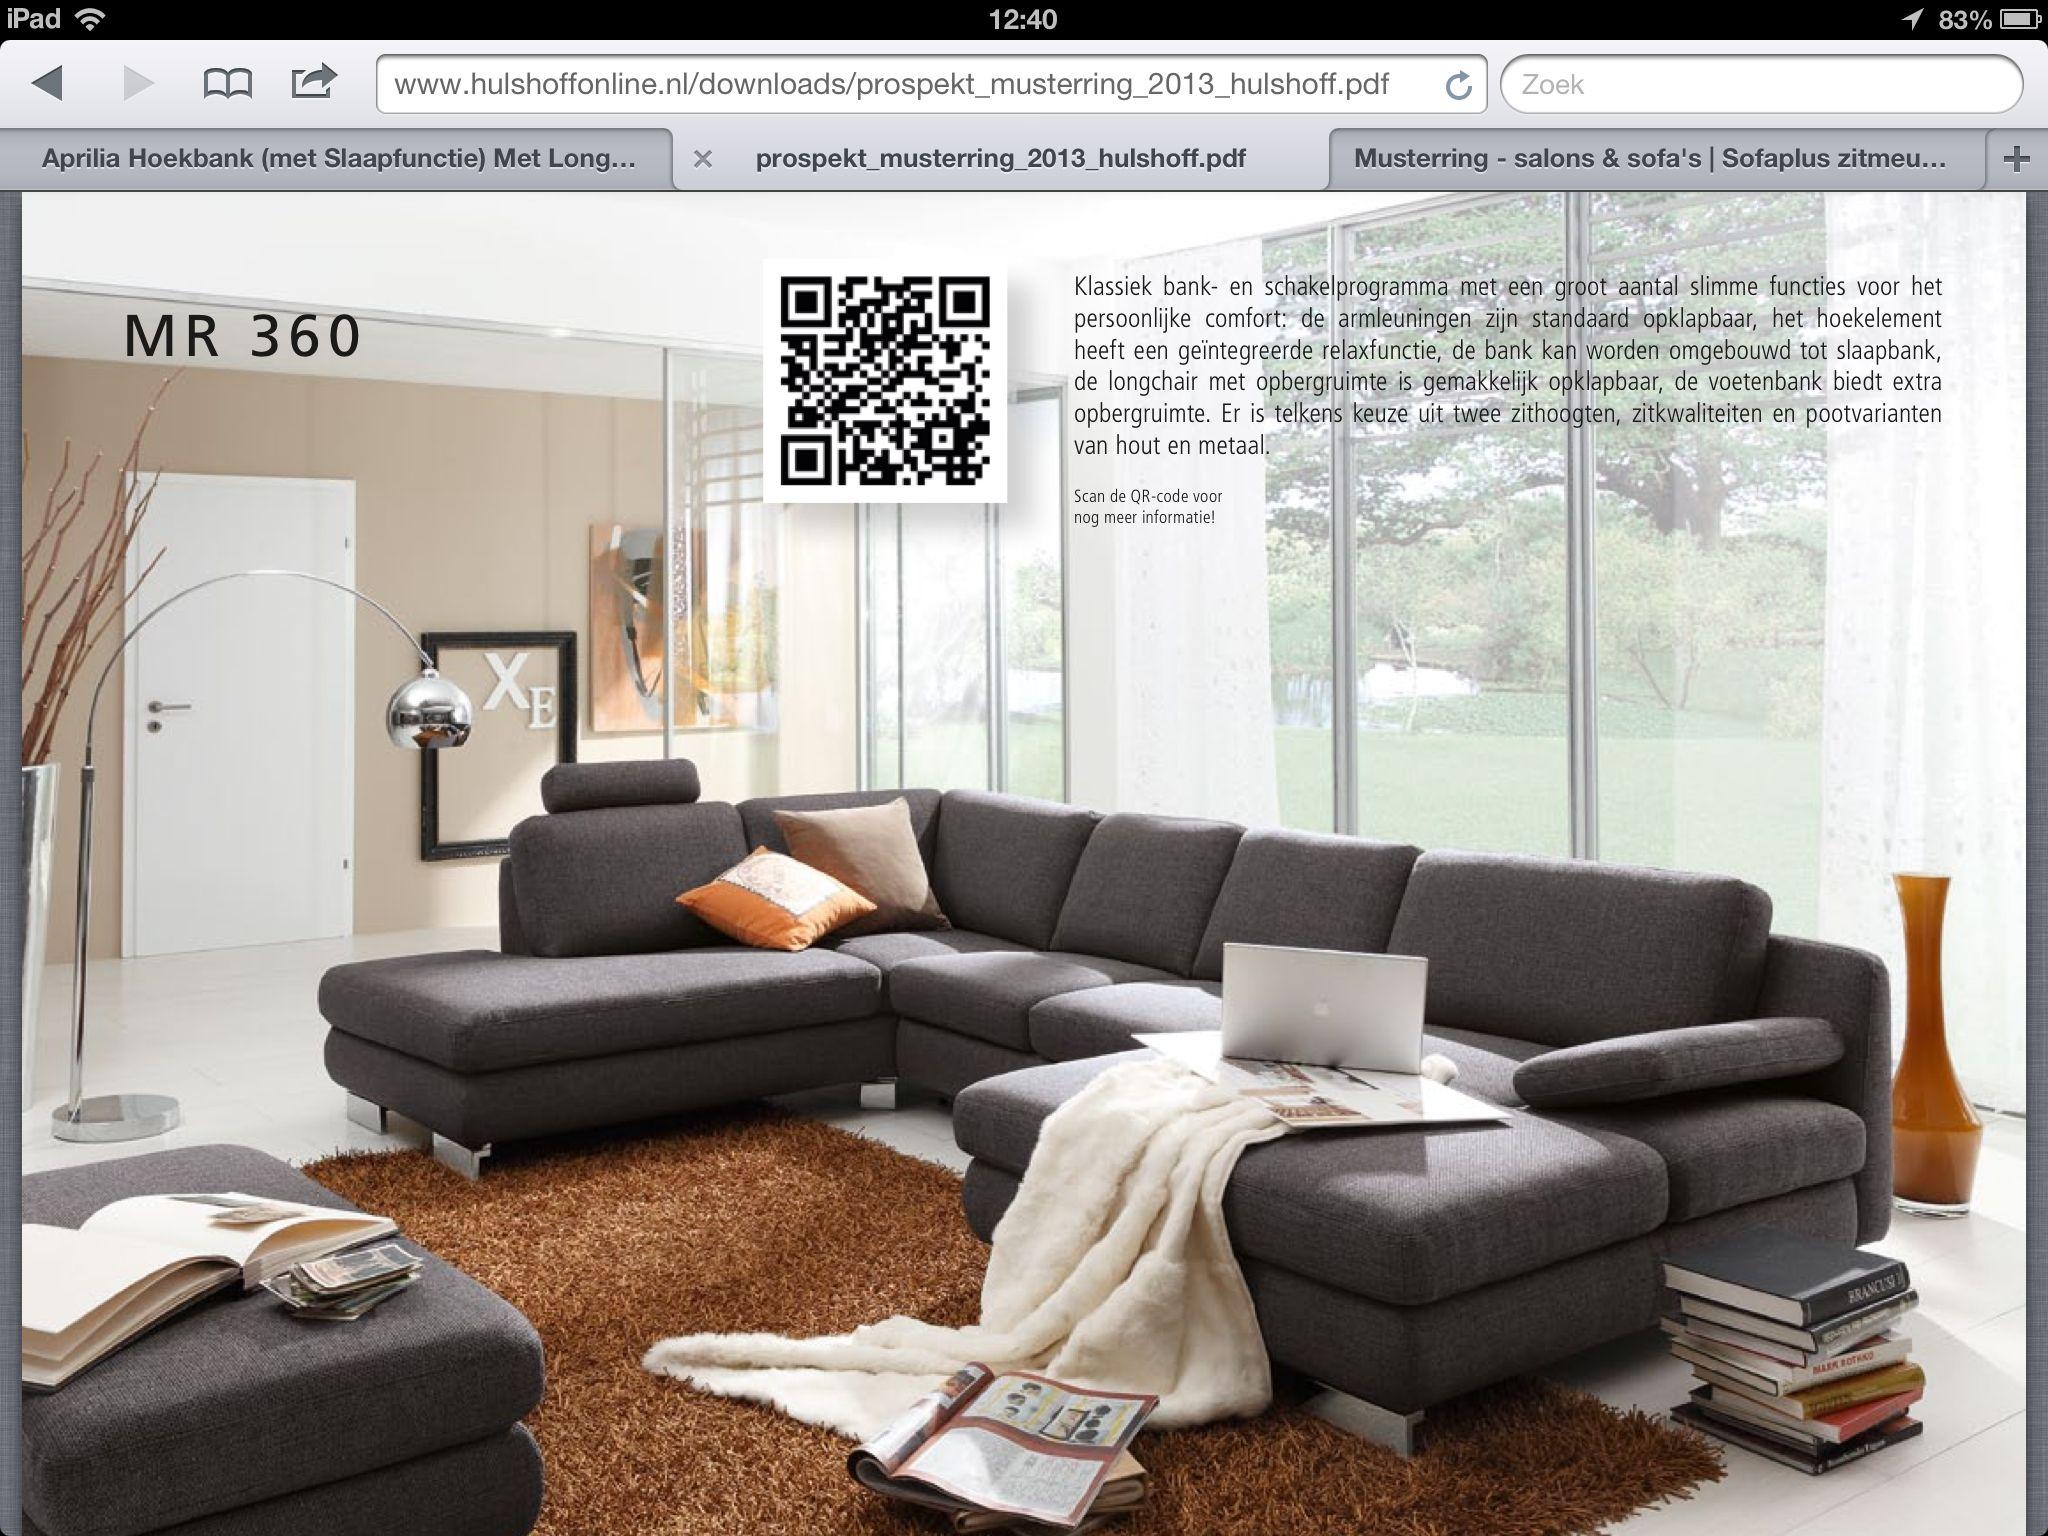 Home nuvola italian inspired leather dark grey sofa collection - Mr 365 Musterring International My Sweet Little Kingdom Pinterest